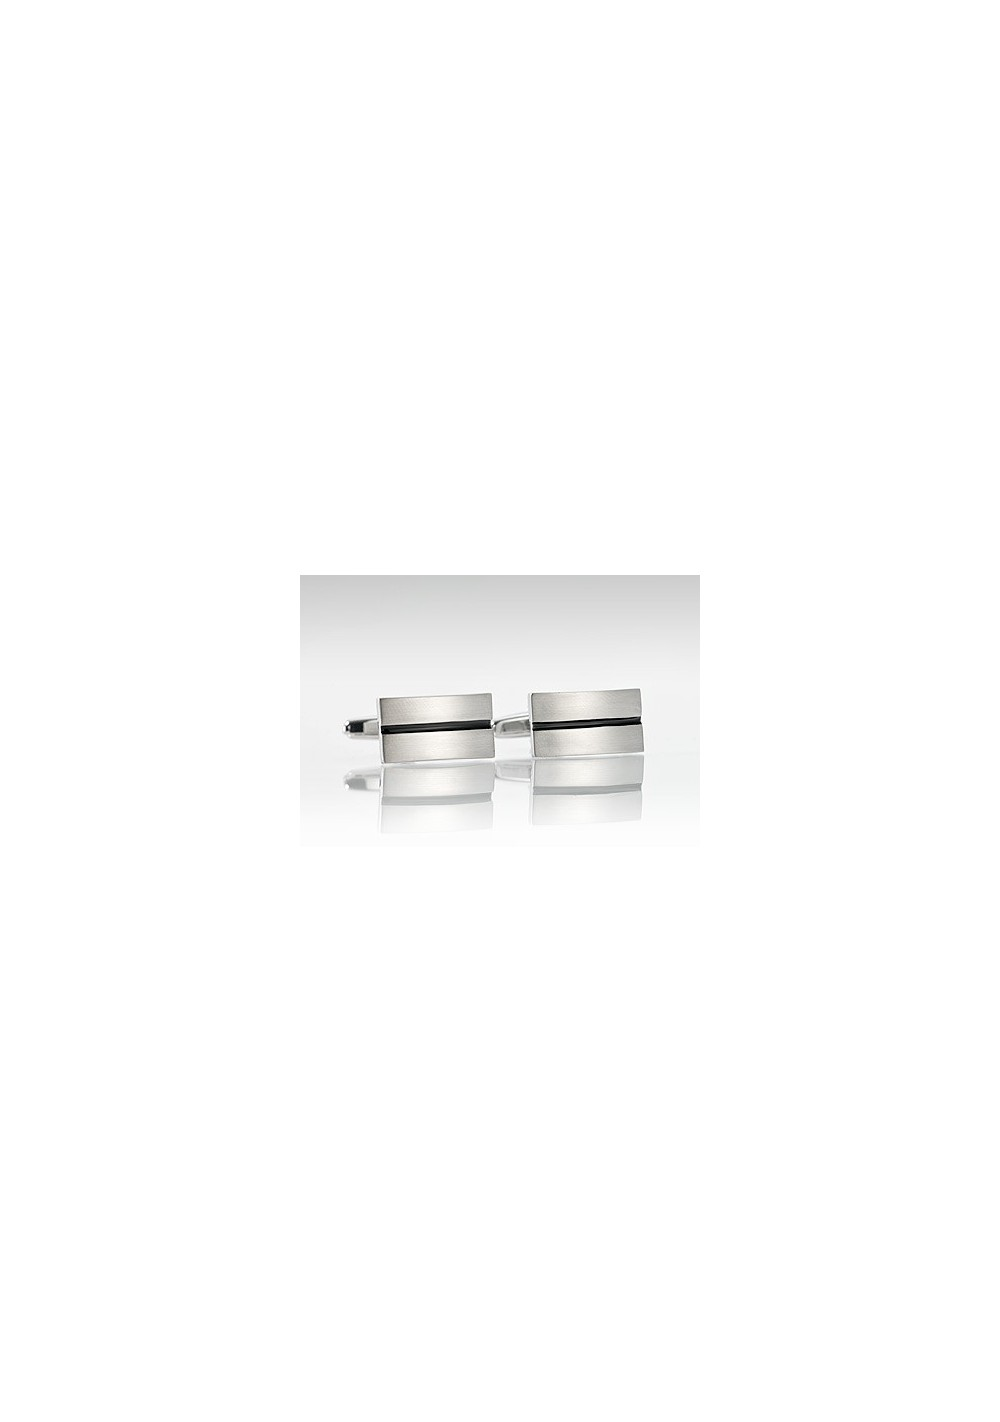 Stainless Steel Cufflinks with Black Resin Center Stripe